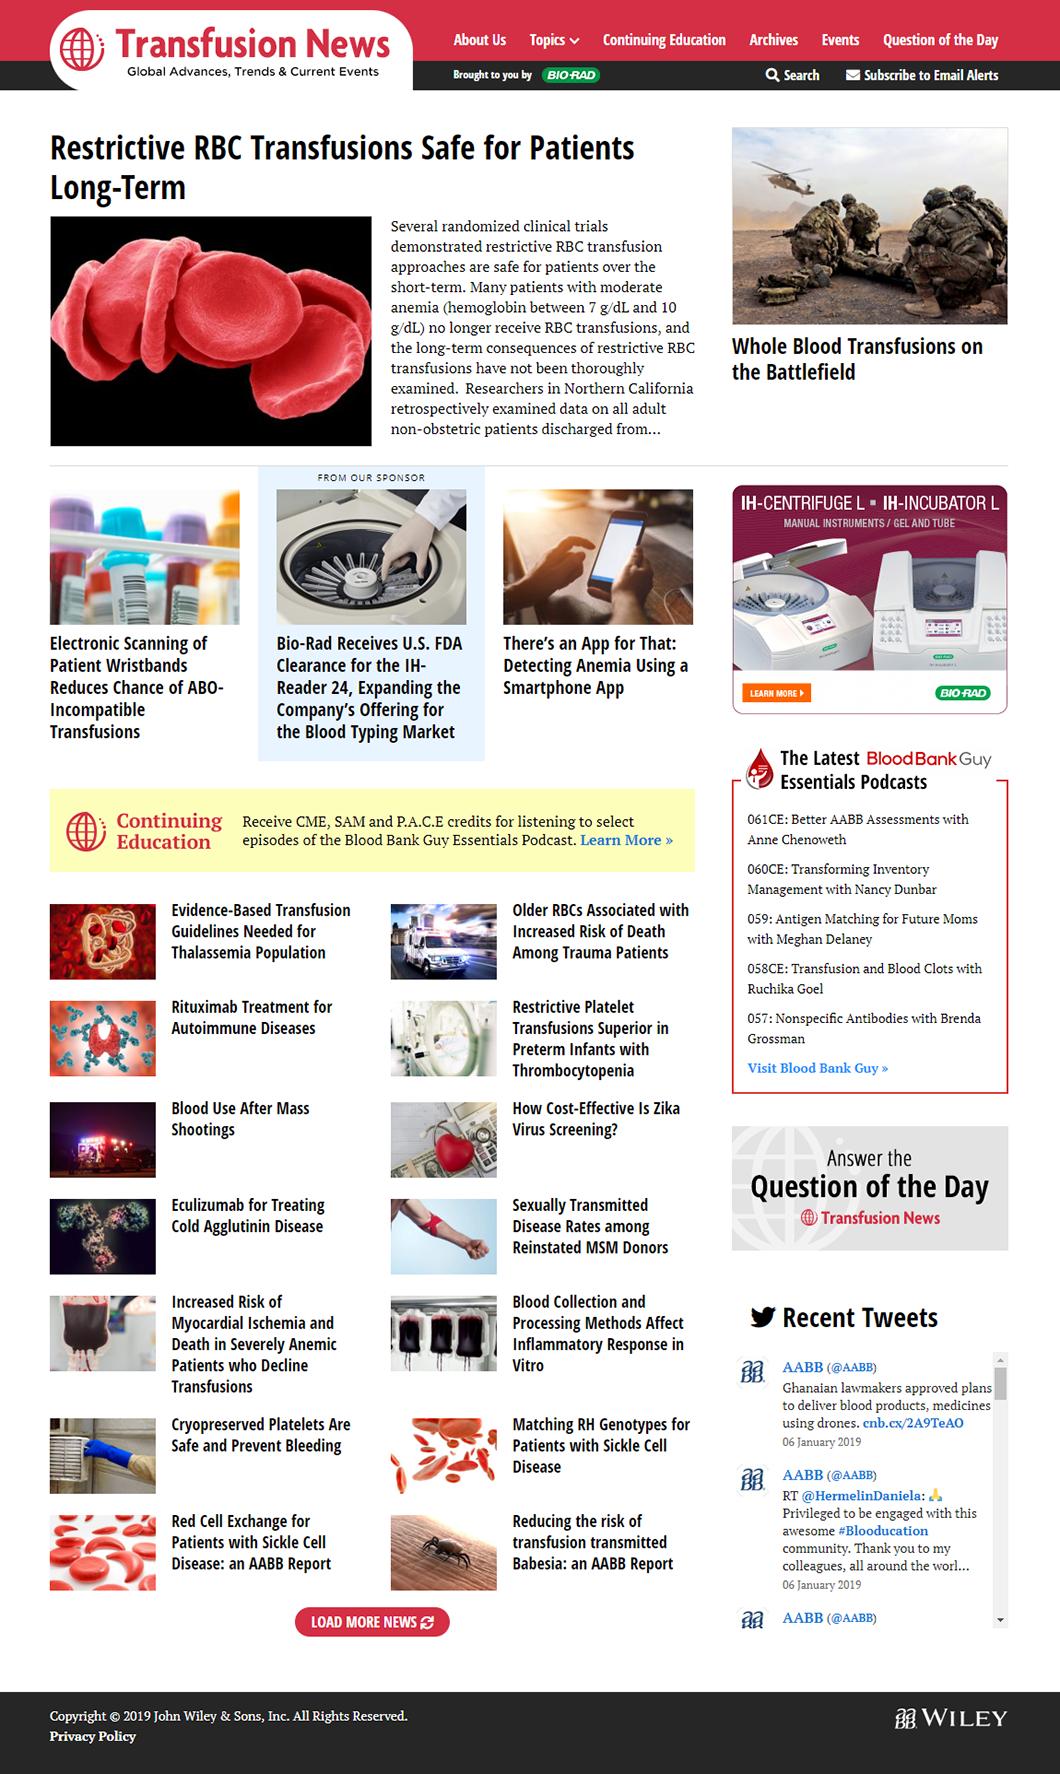 Transfusion News